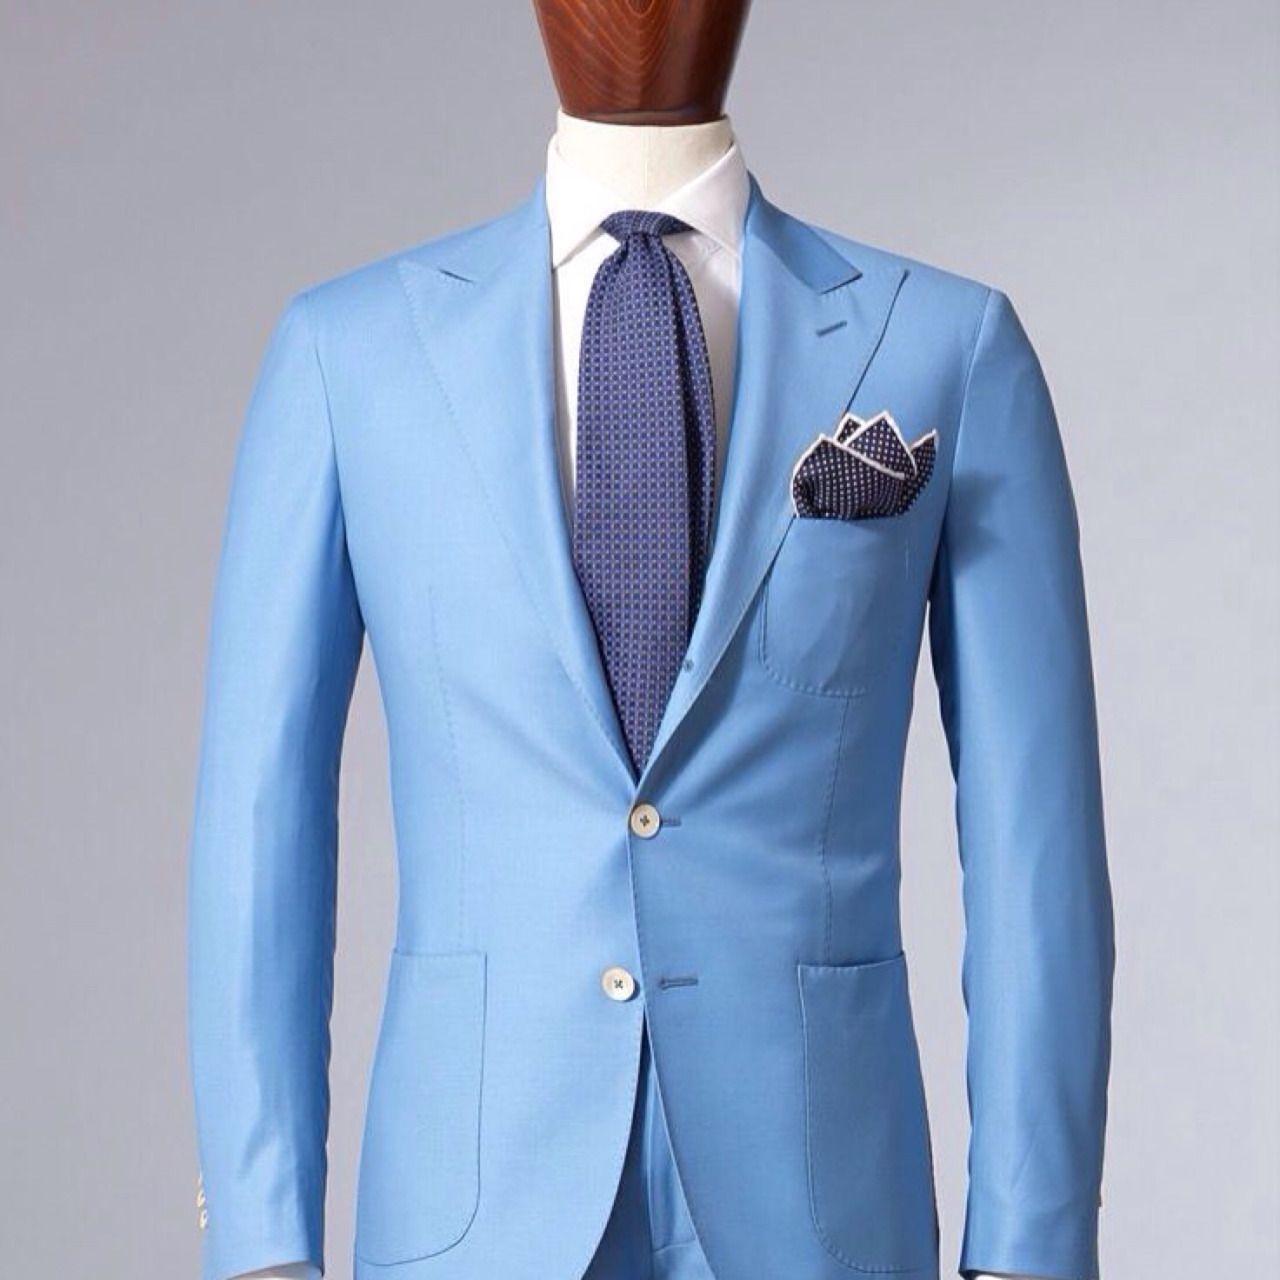 Global Style - Men | Men style | Pinterest | British style, Style ...